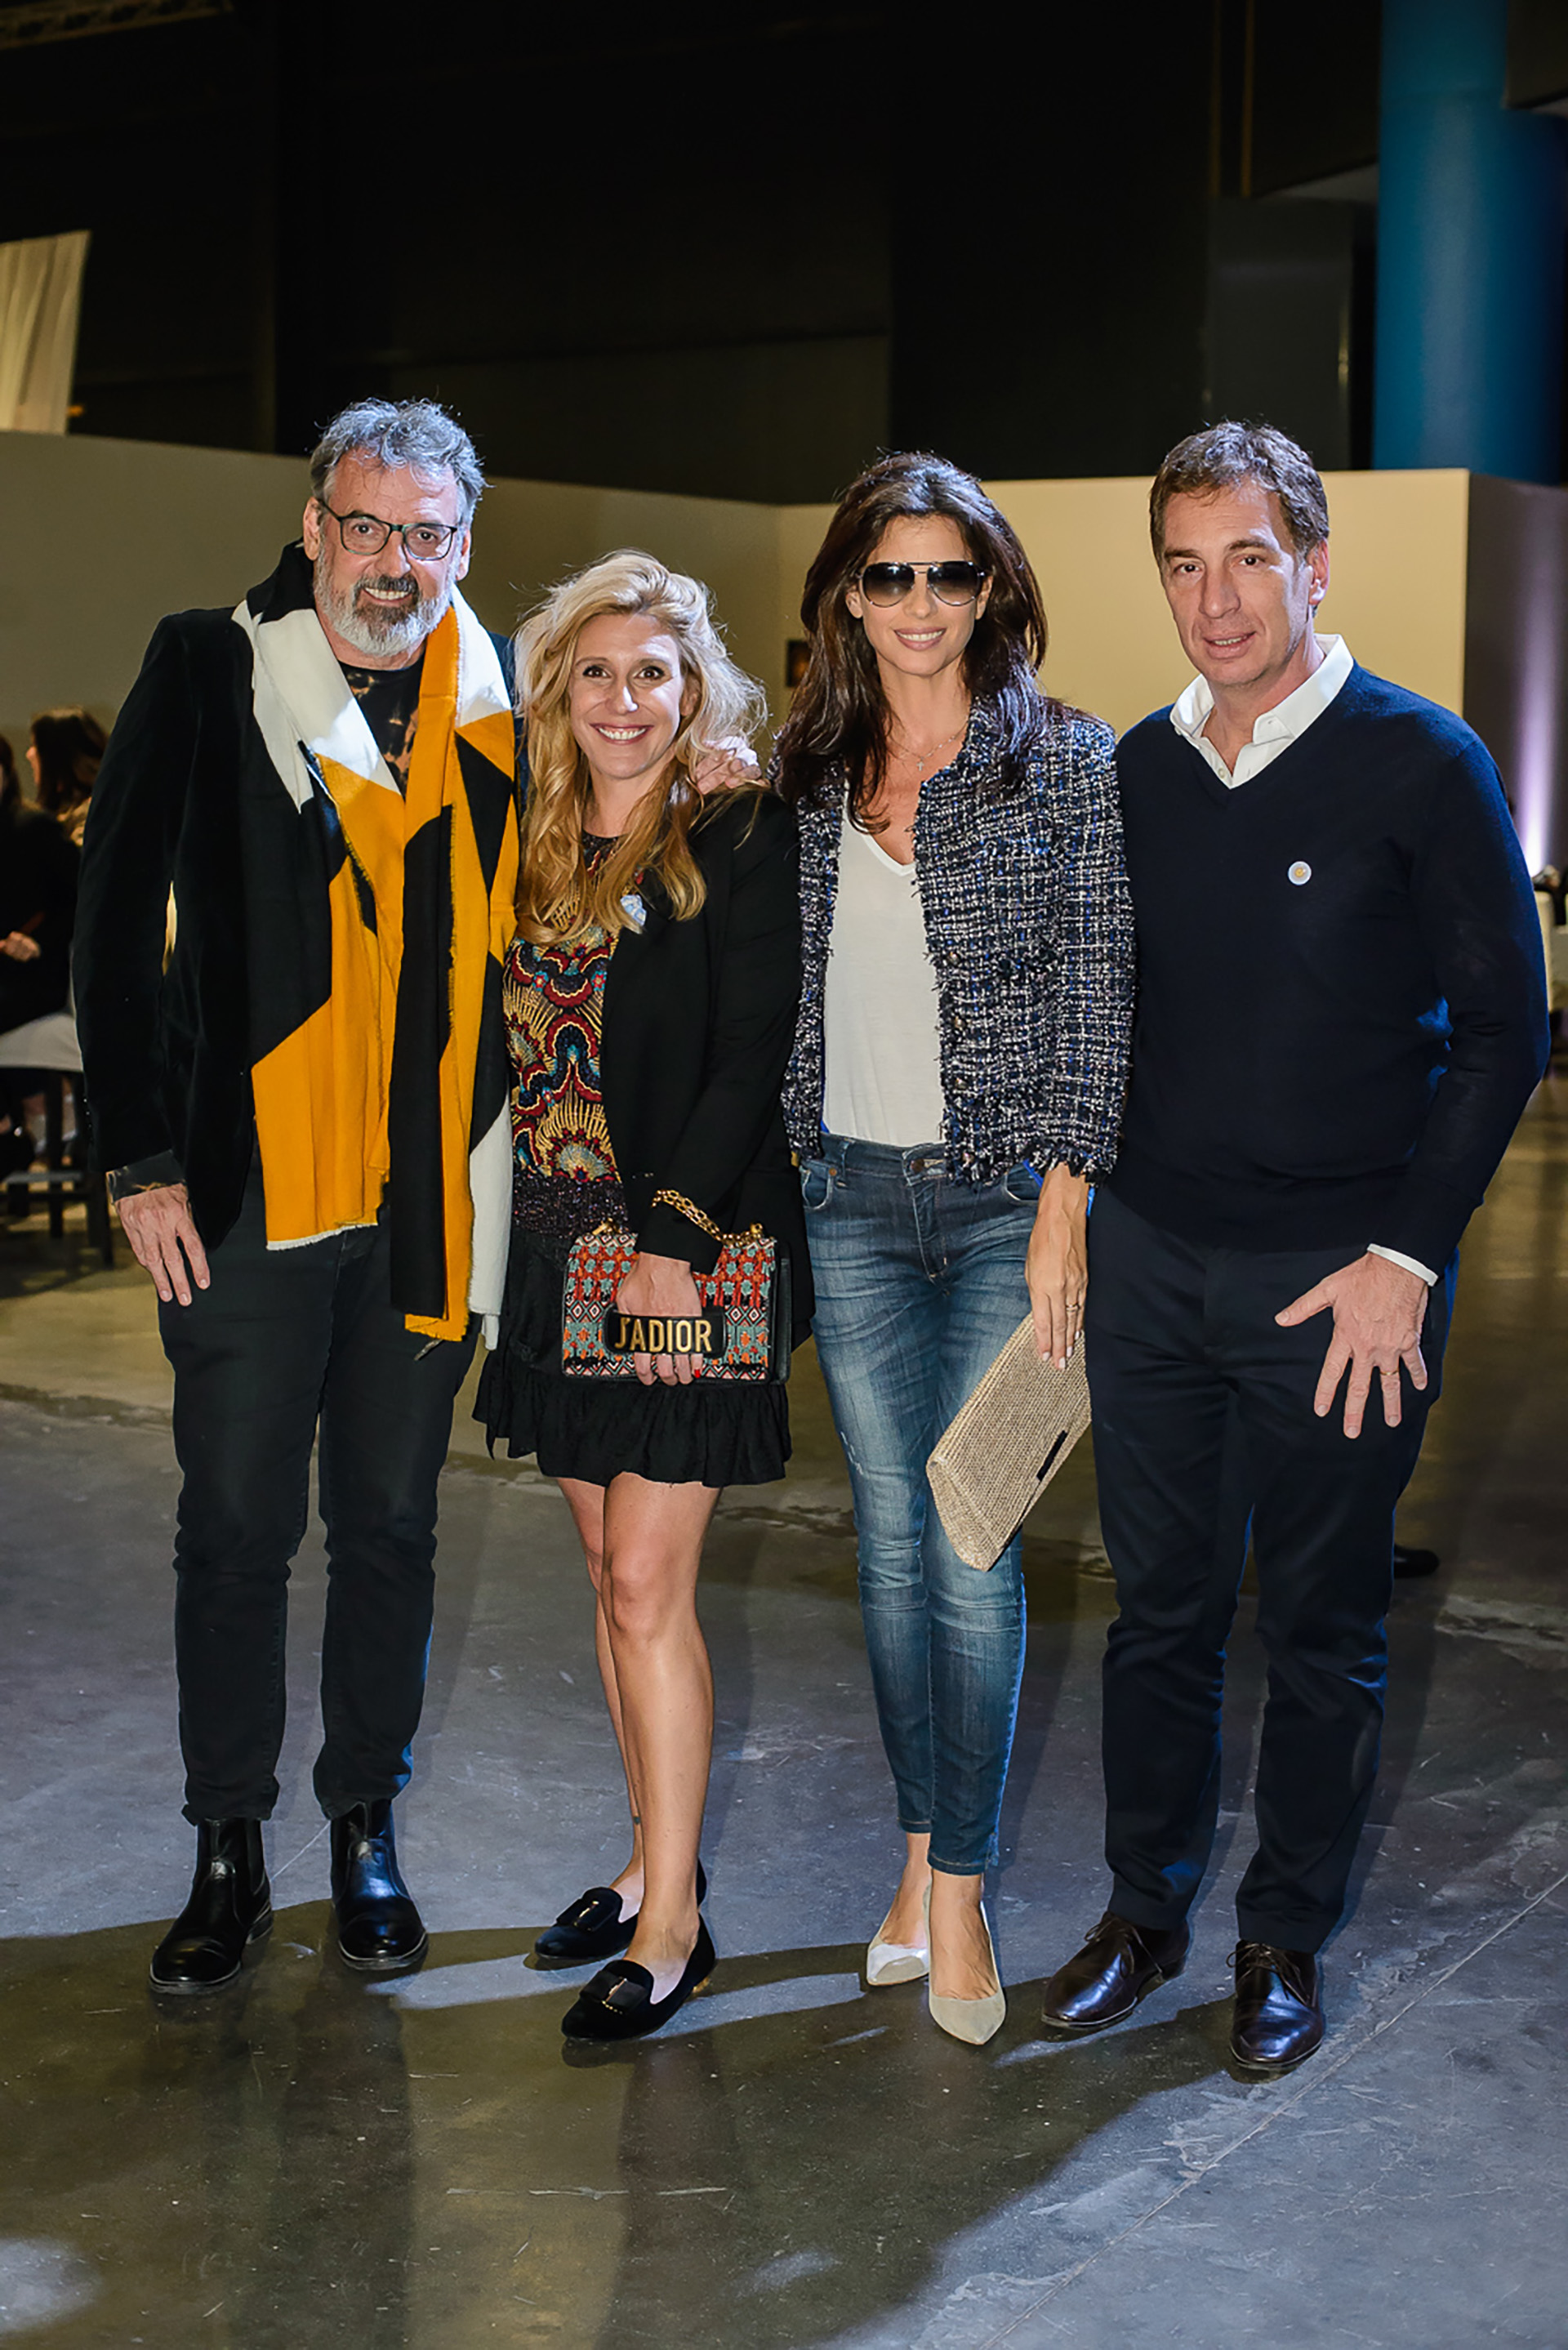 Benito Fernández, Amalia Amoedo, Analía Maiorana y Diego Santilli